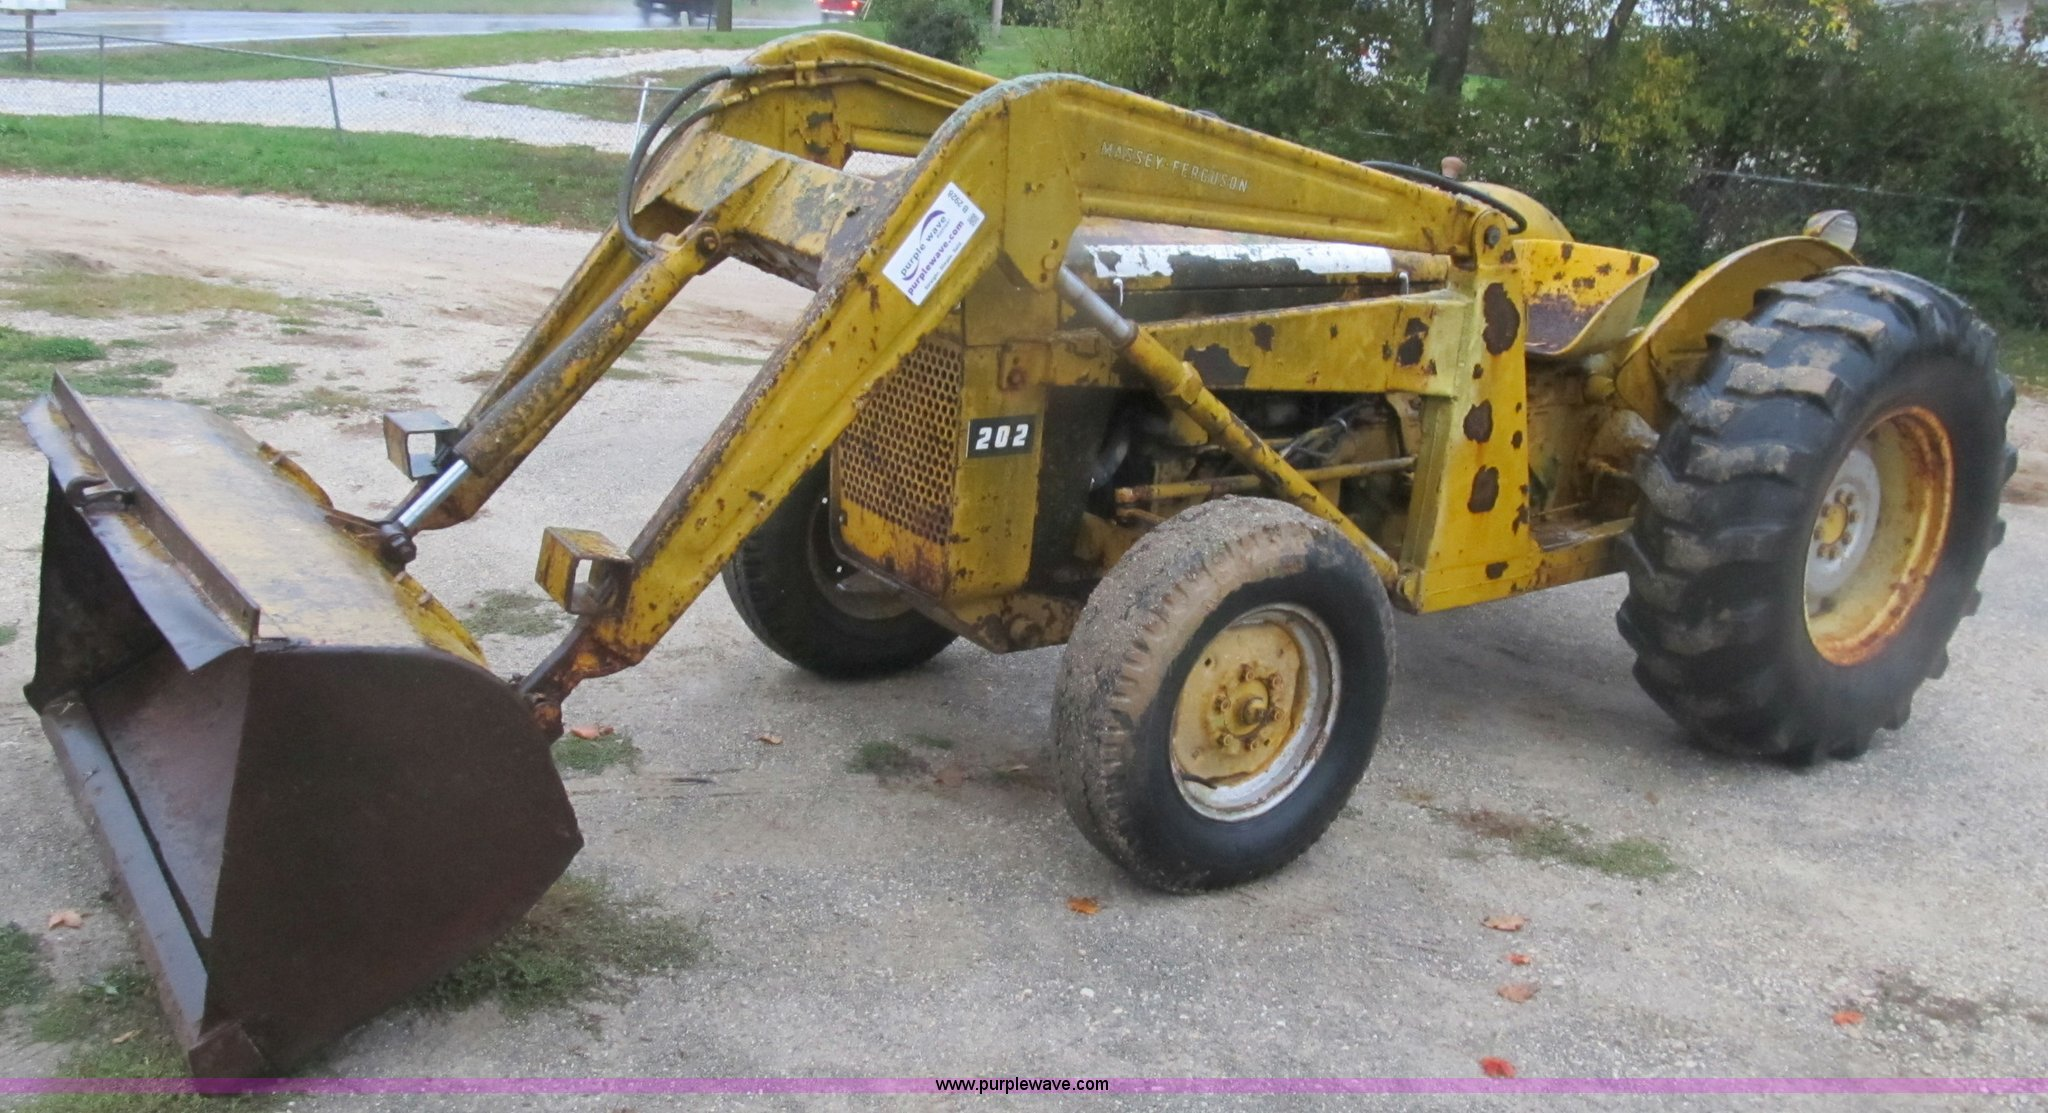 1959 Massey-Ferguson 202 Industrial Work Bull tractor   Item